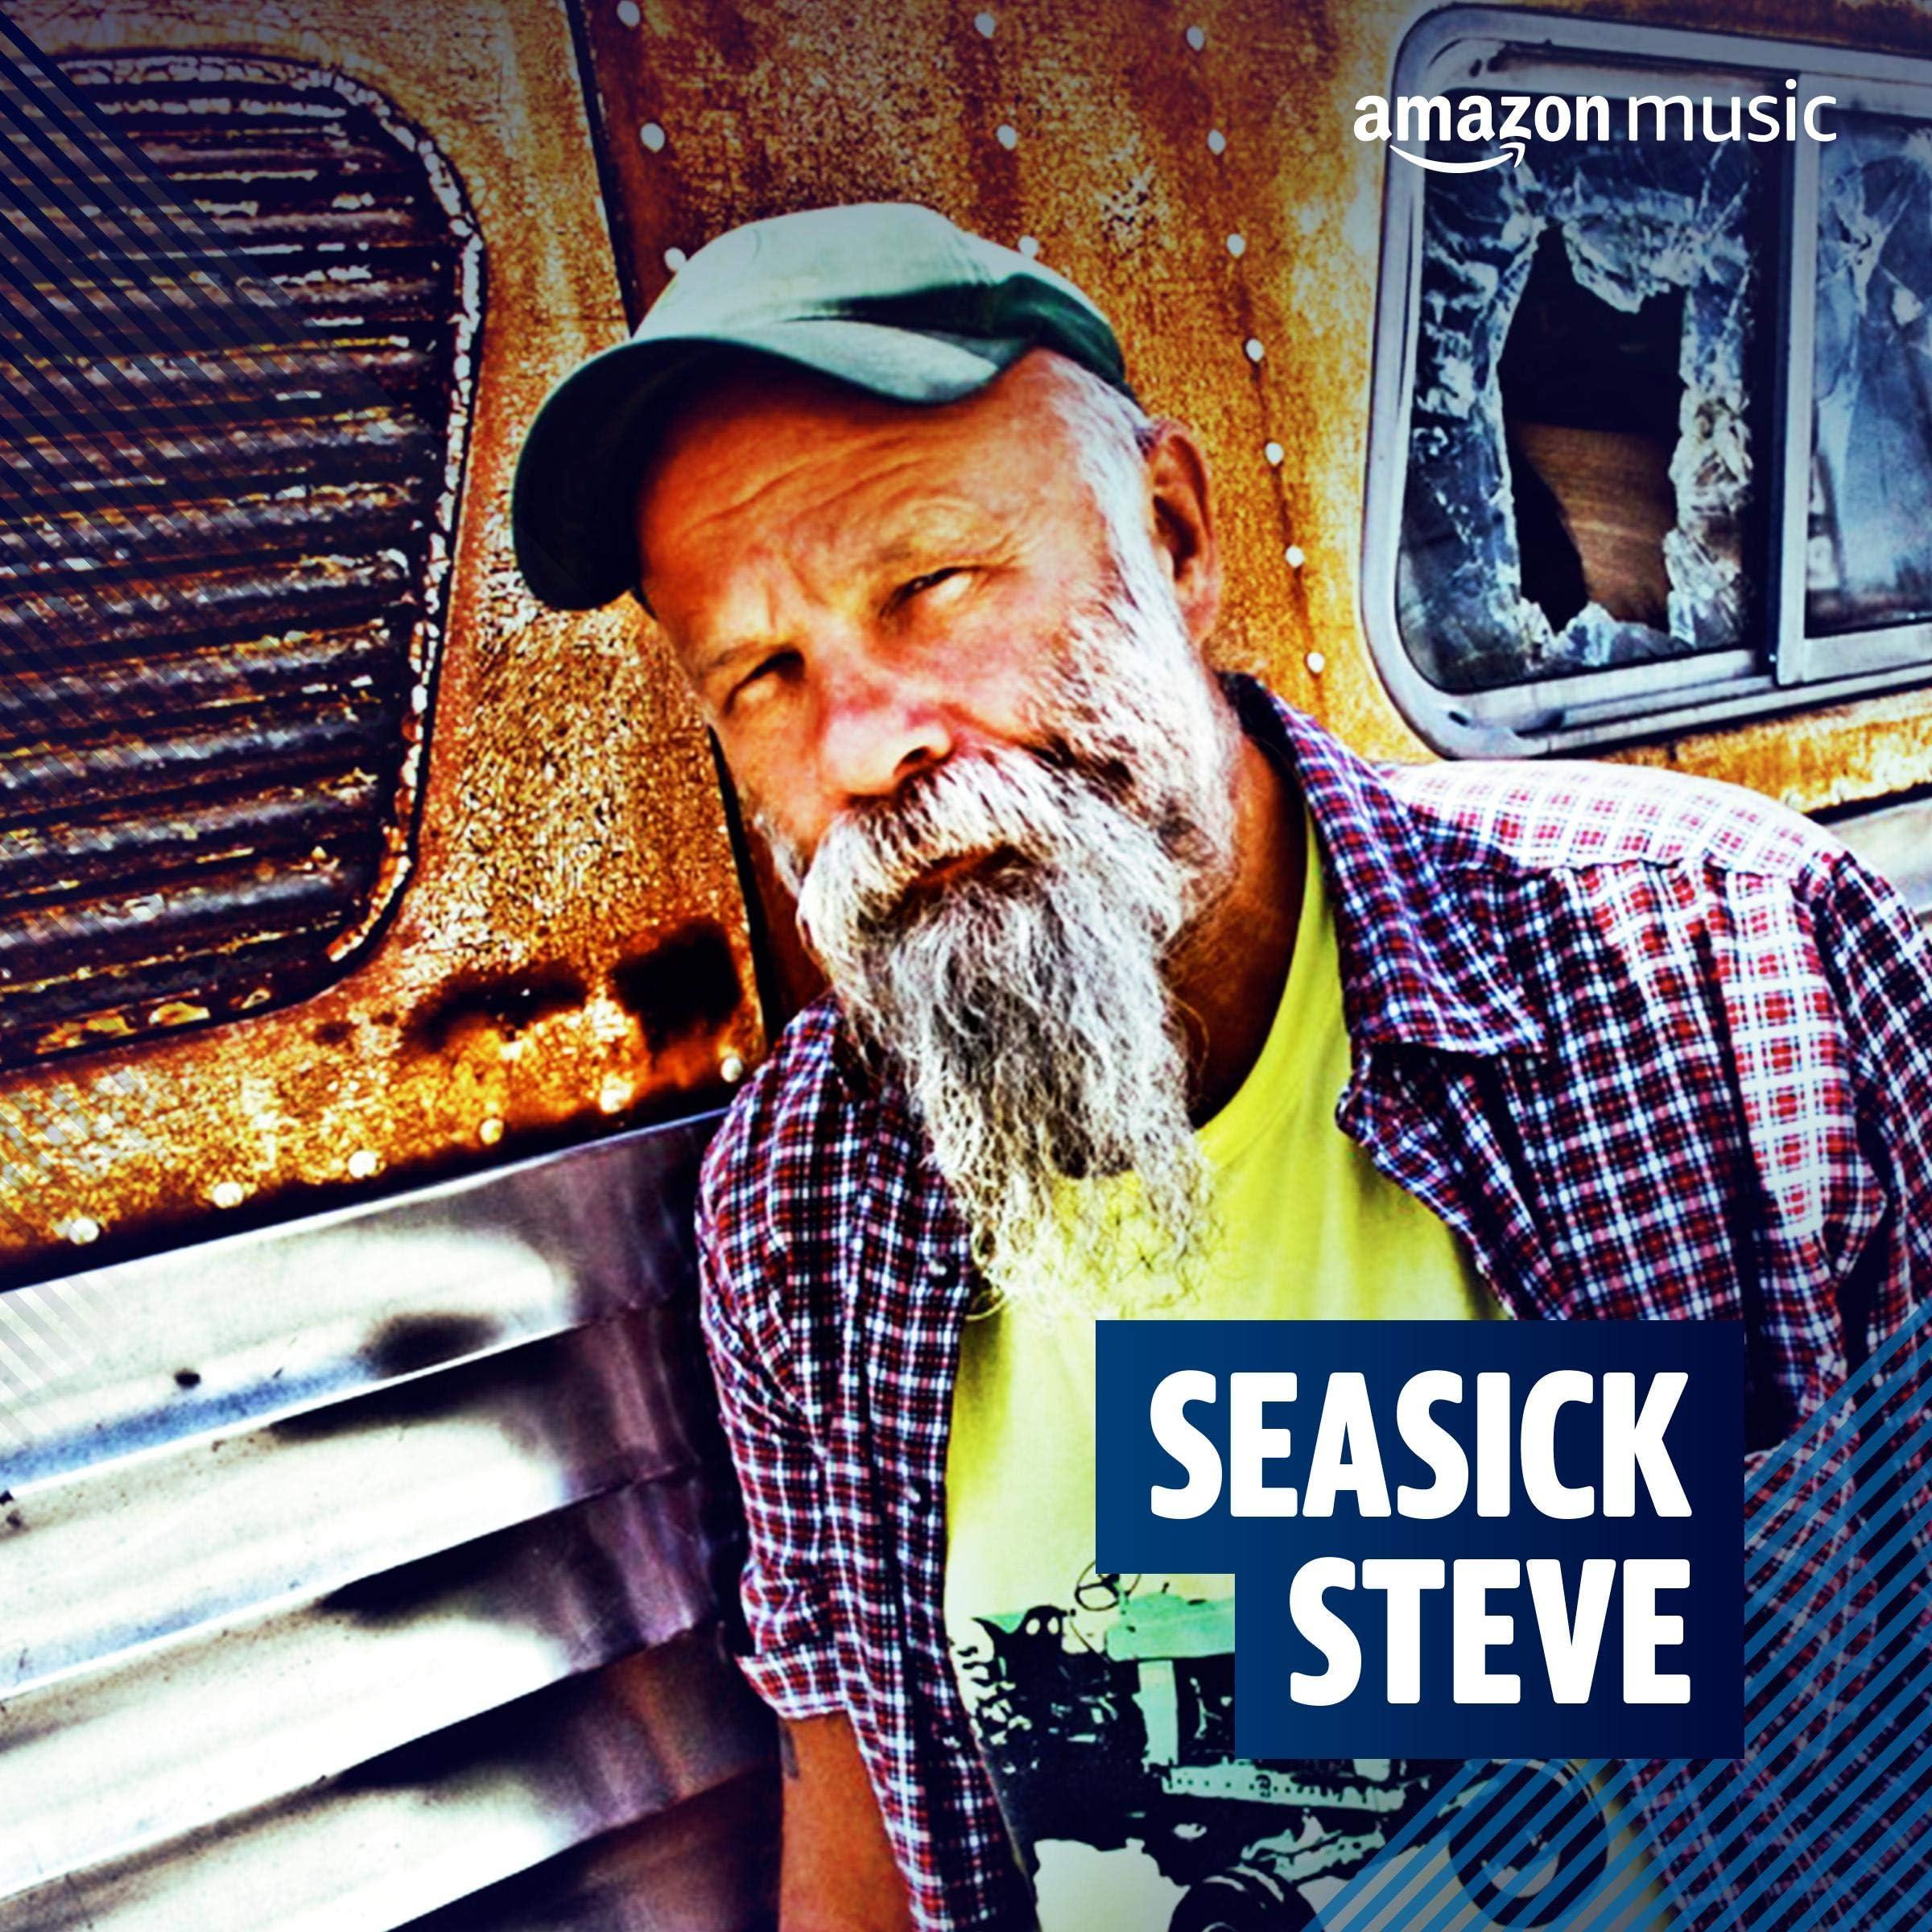 Seasick Steve